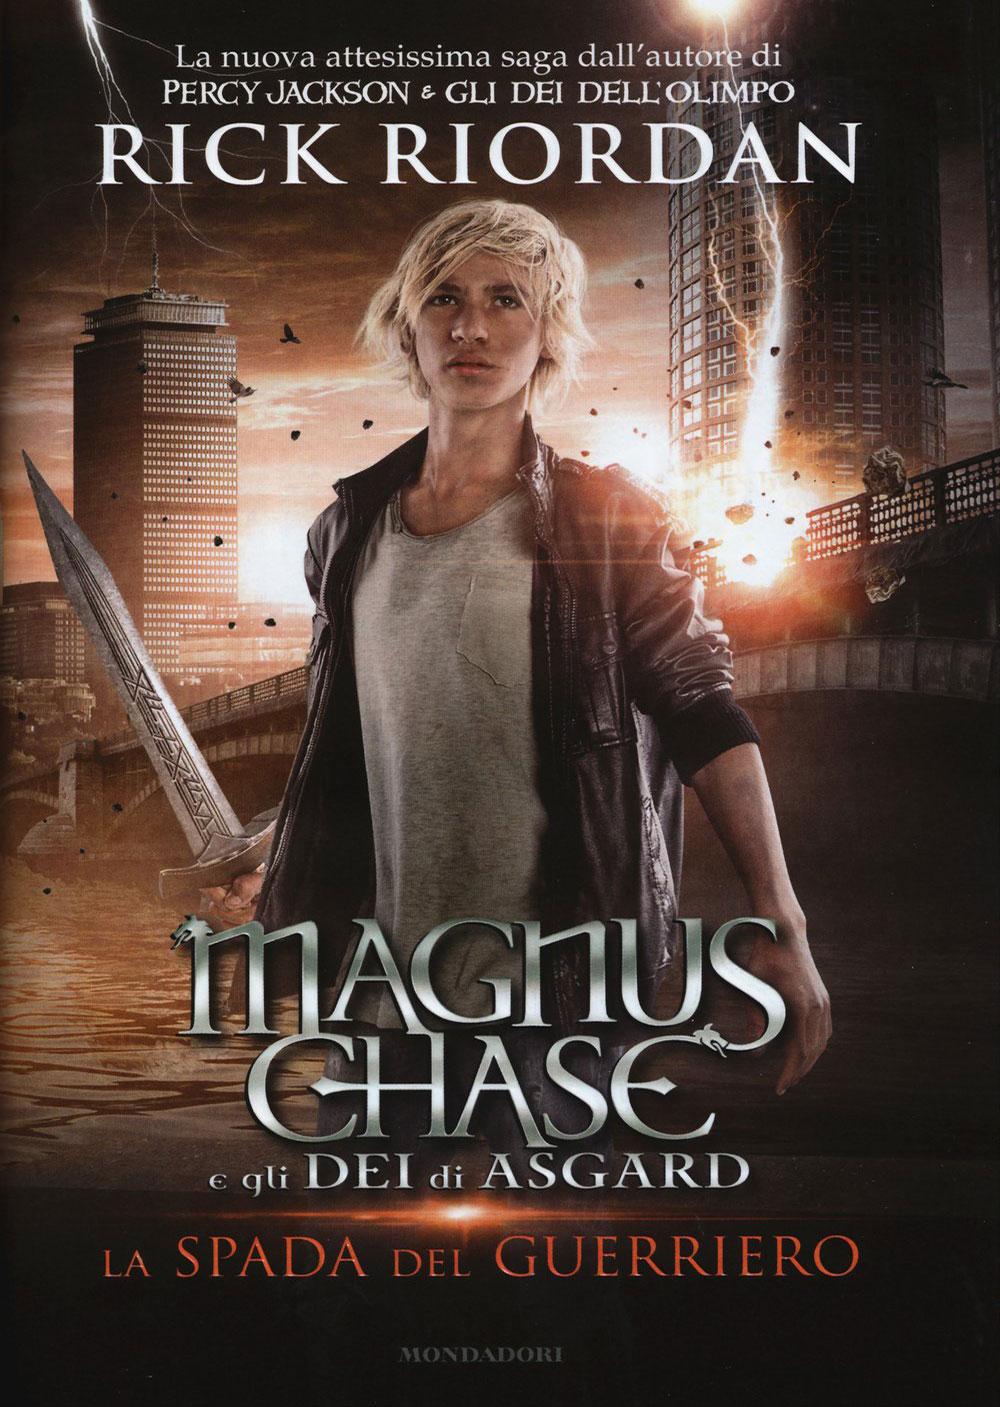 Magnus Chase. La spada del guerriero